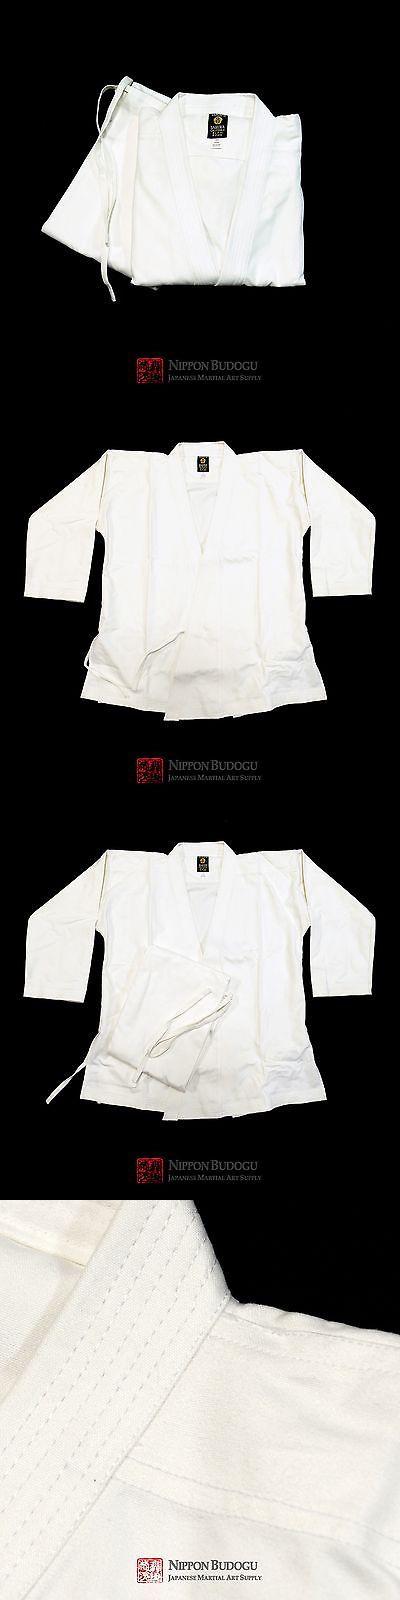 Uniforms and Gis 179774: New 12Oz Heavyweight Karate Gi Uniform Set Karate Martial Arts Gi -> BUY IT NOW ONLY: $59.95 on eBay!